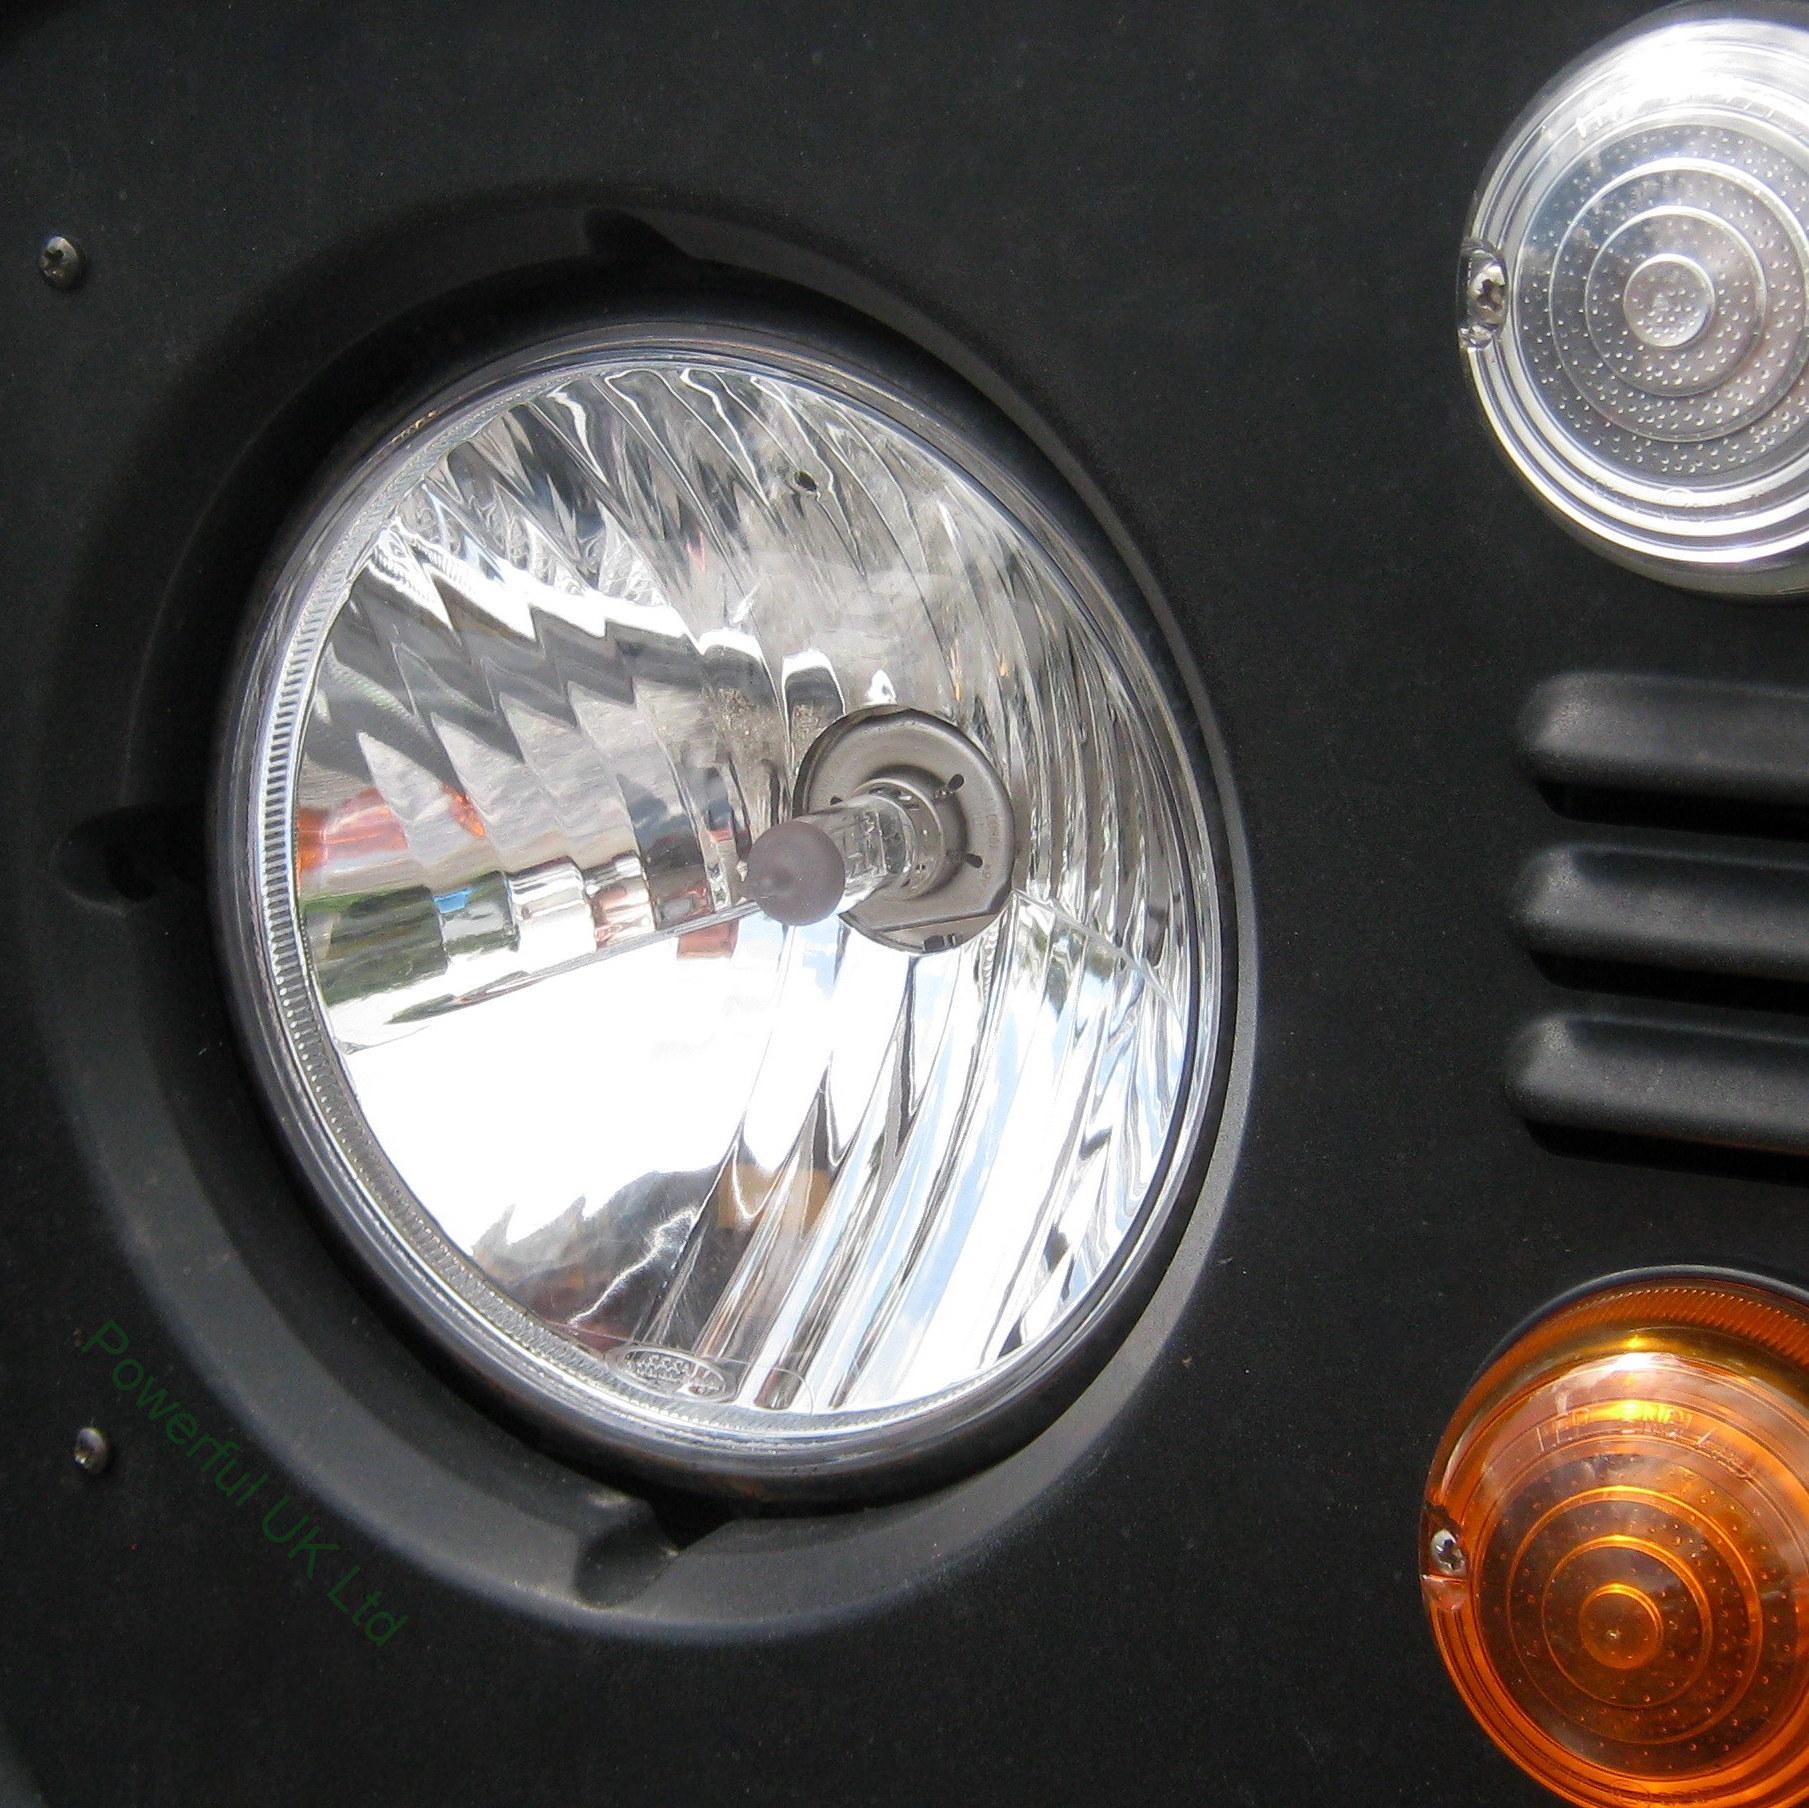 Details about Crystal Halogen Headlight Upgrade Kit Land Rover Defender 90  110 H4 quadoptic